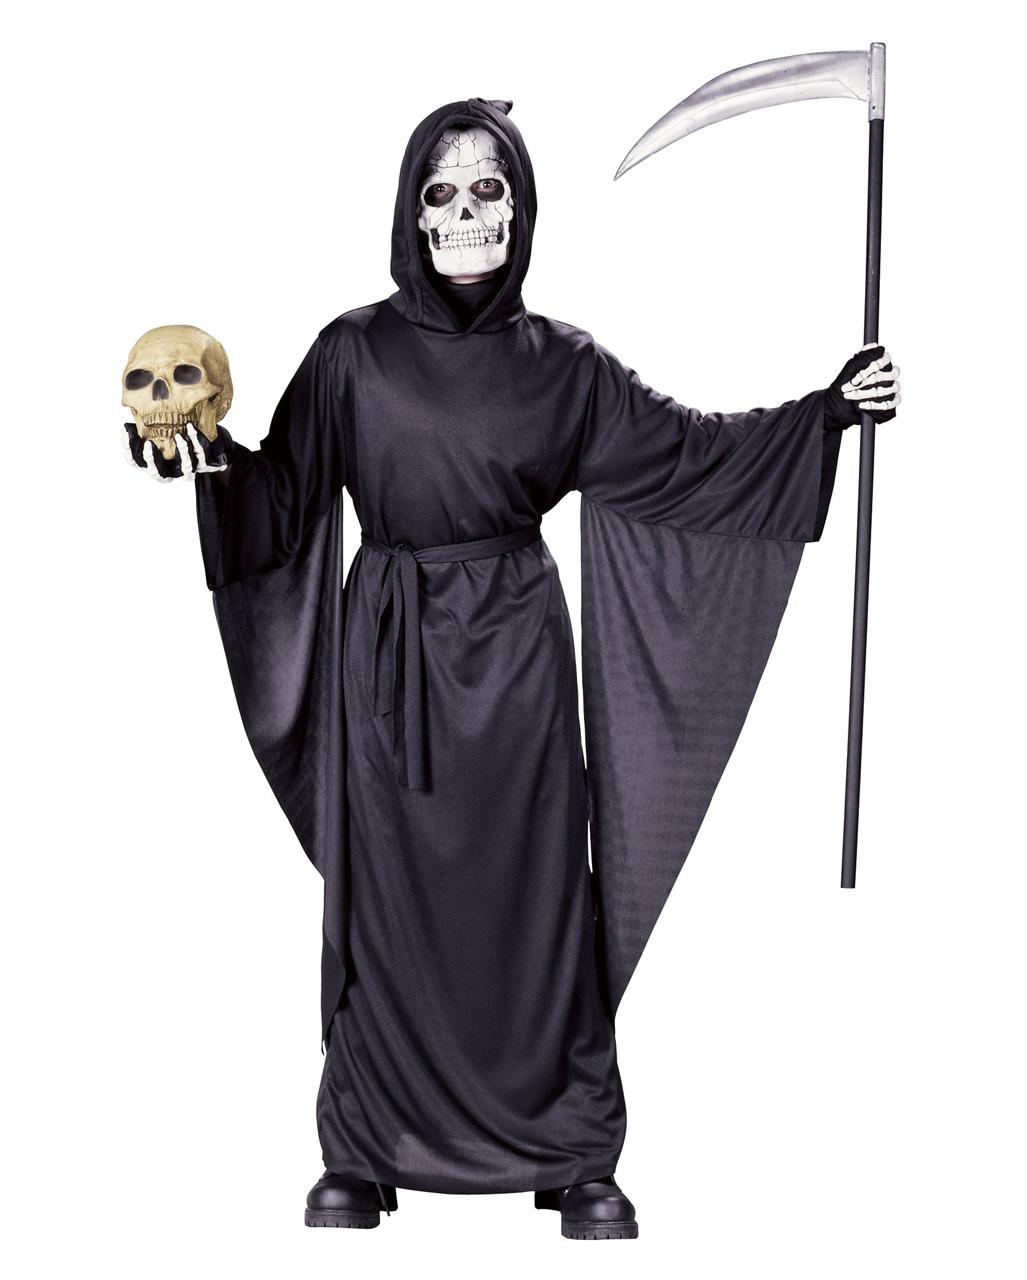 Grim Reaper Cosplay Black Costume Full Set Outfit Halloween Gift Cloak Pants